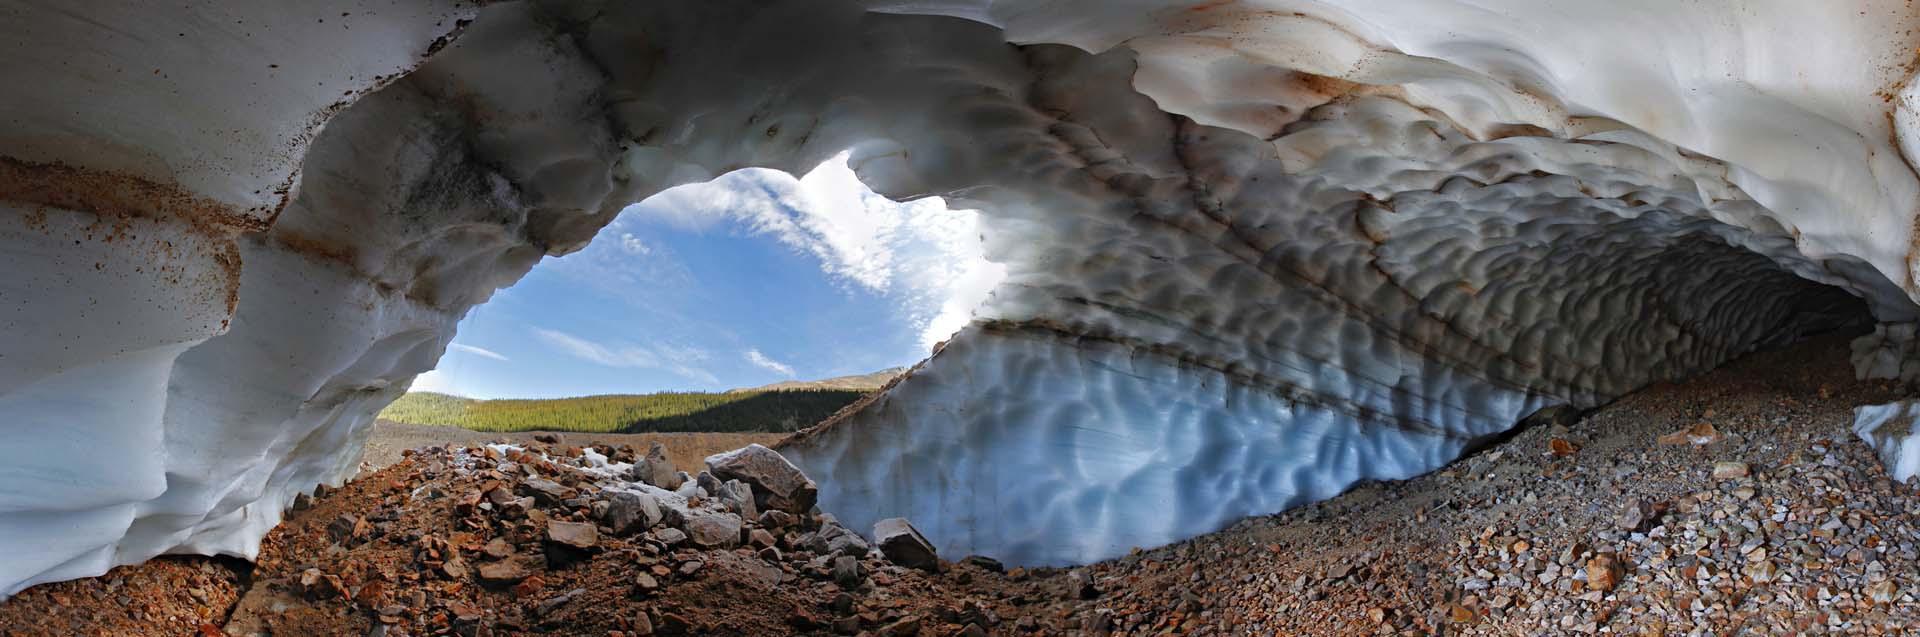 0302-0310_angel_glacier_cave_fused_20101